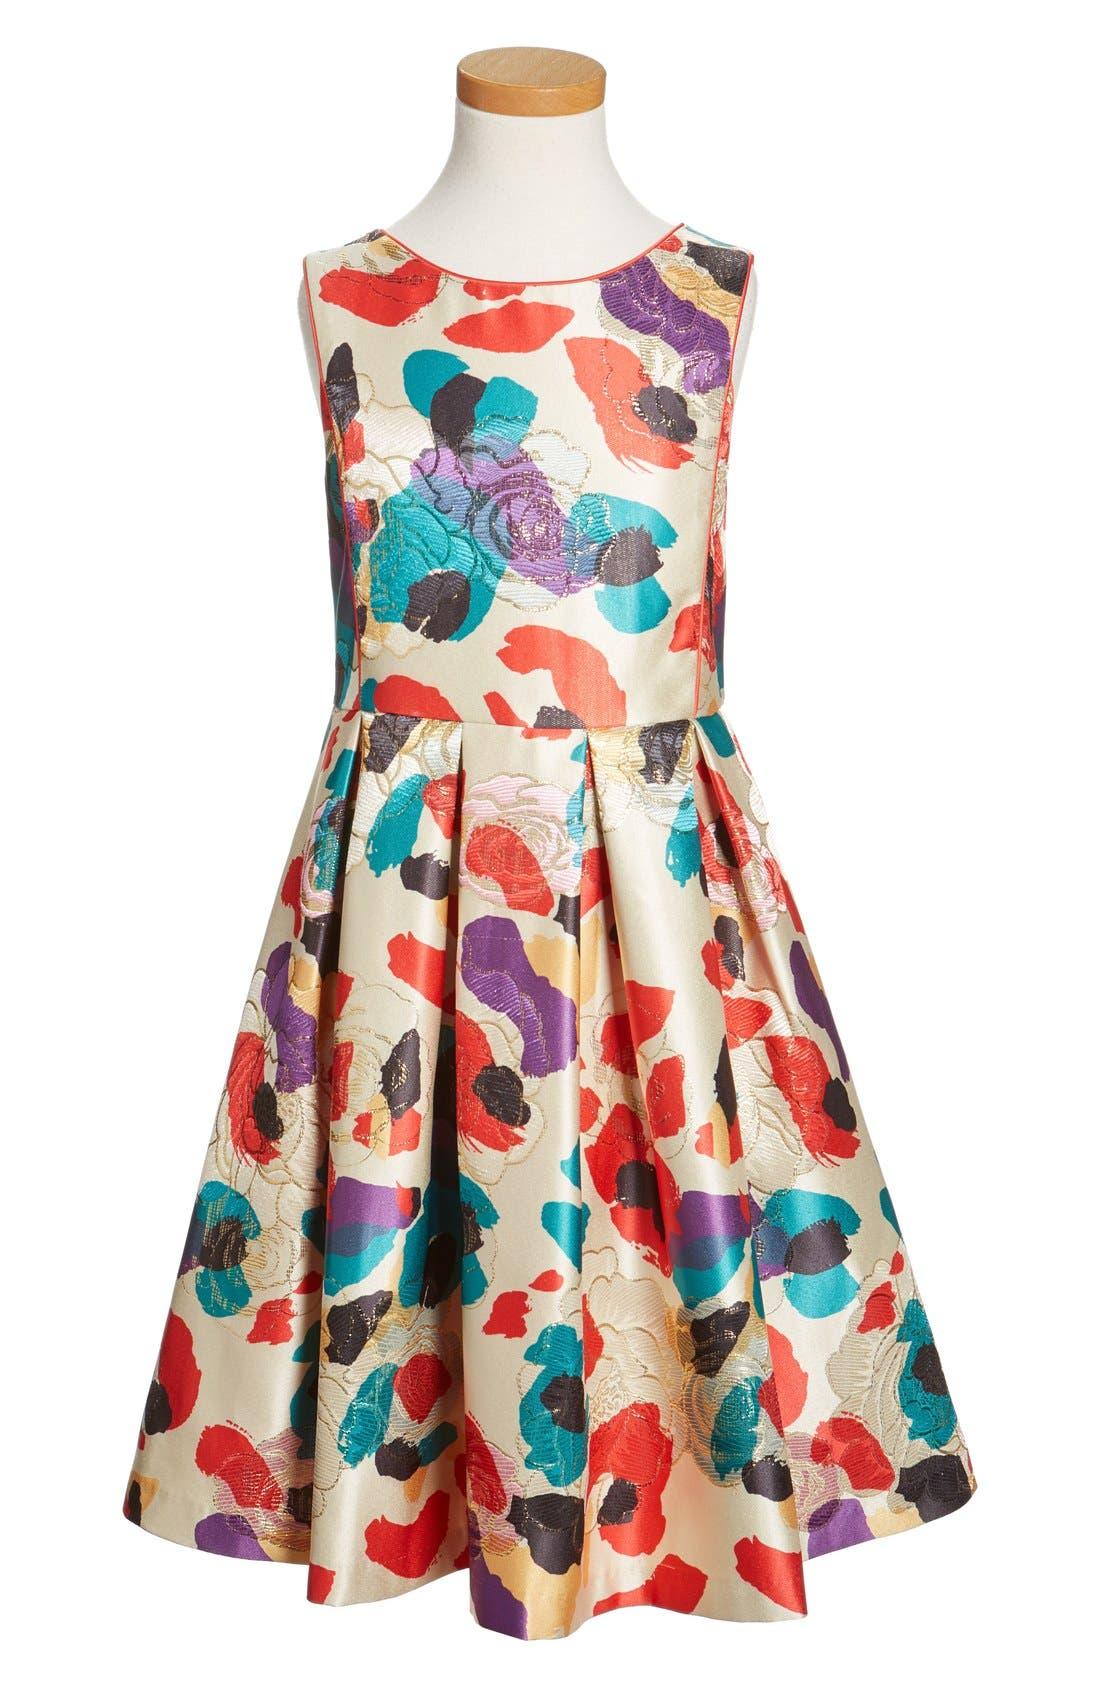 Watercolor Floral Brocade Dress,                         Main,                         color, Multi Red